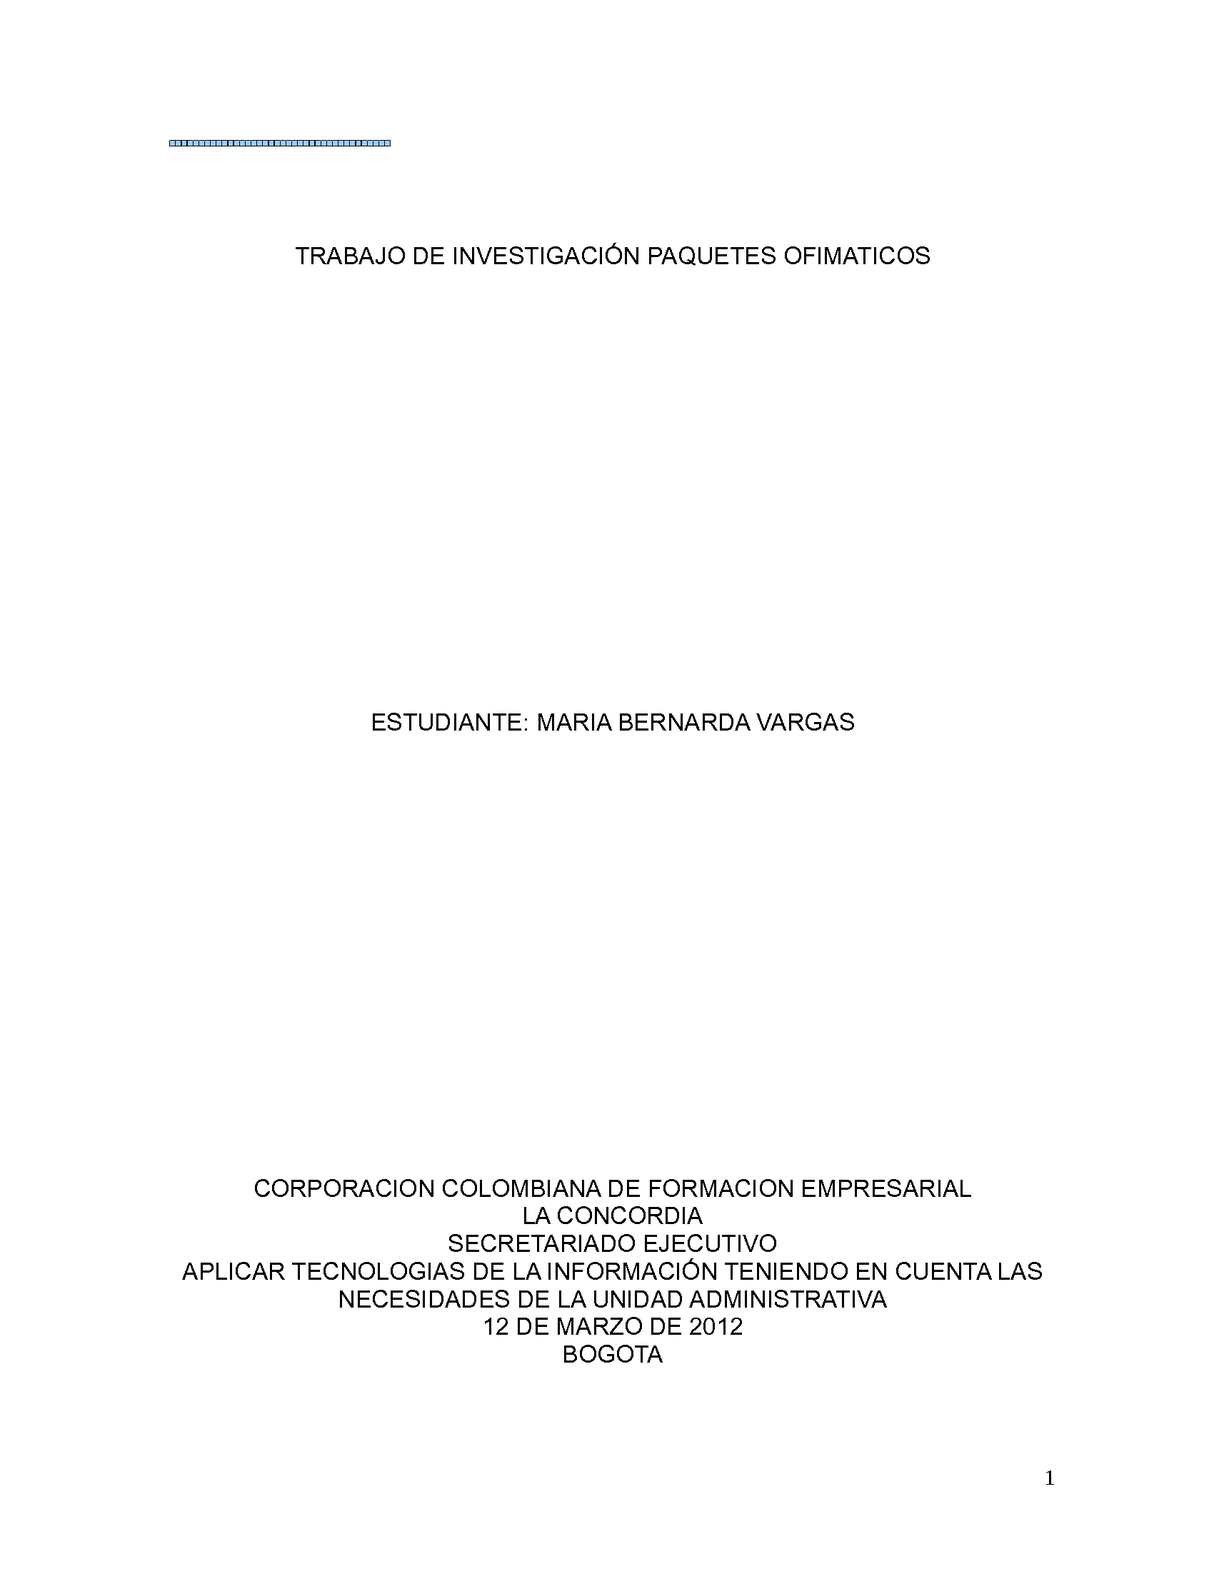 Calaméo - PAQUETES OFIMATICOS